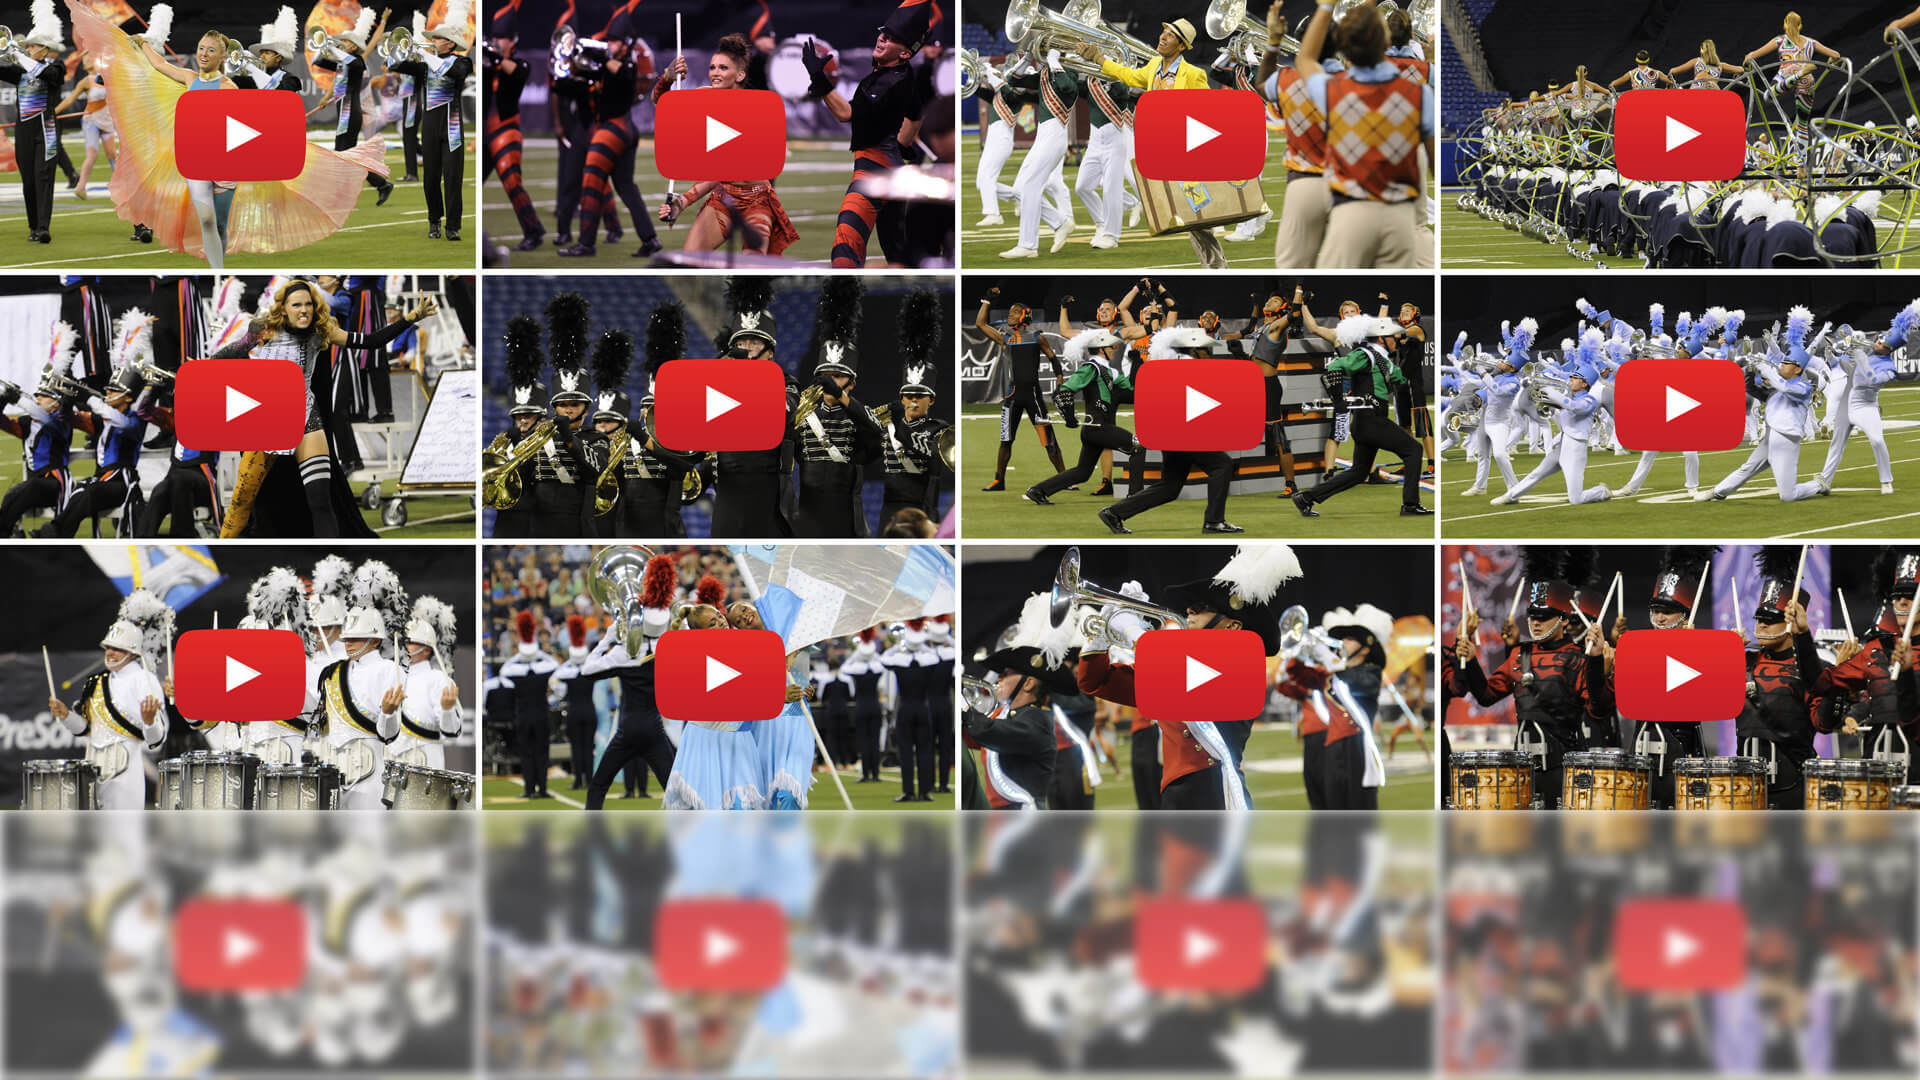 2015 World Championship Finals video sampler